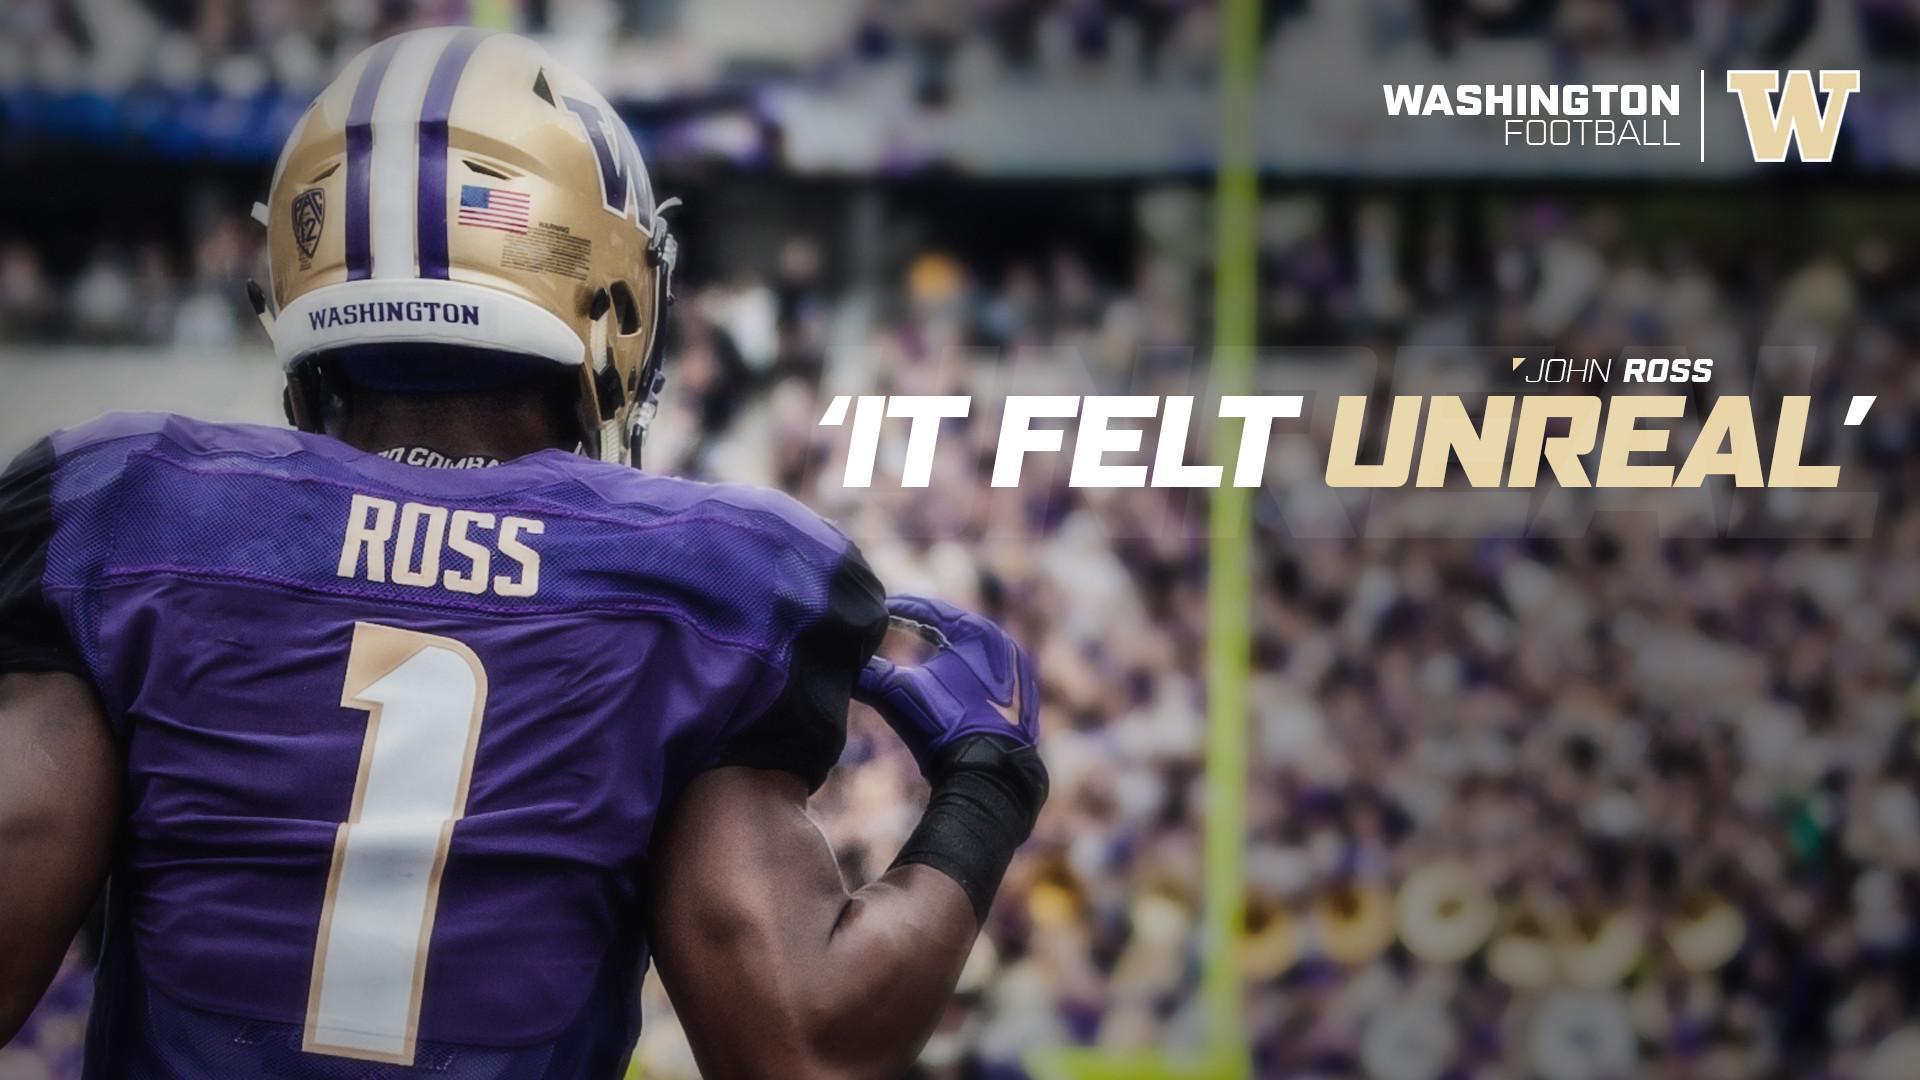 Ross On Three TDs In His Return: 'It Felt Unreal'